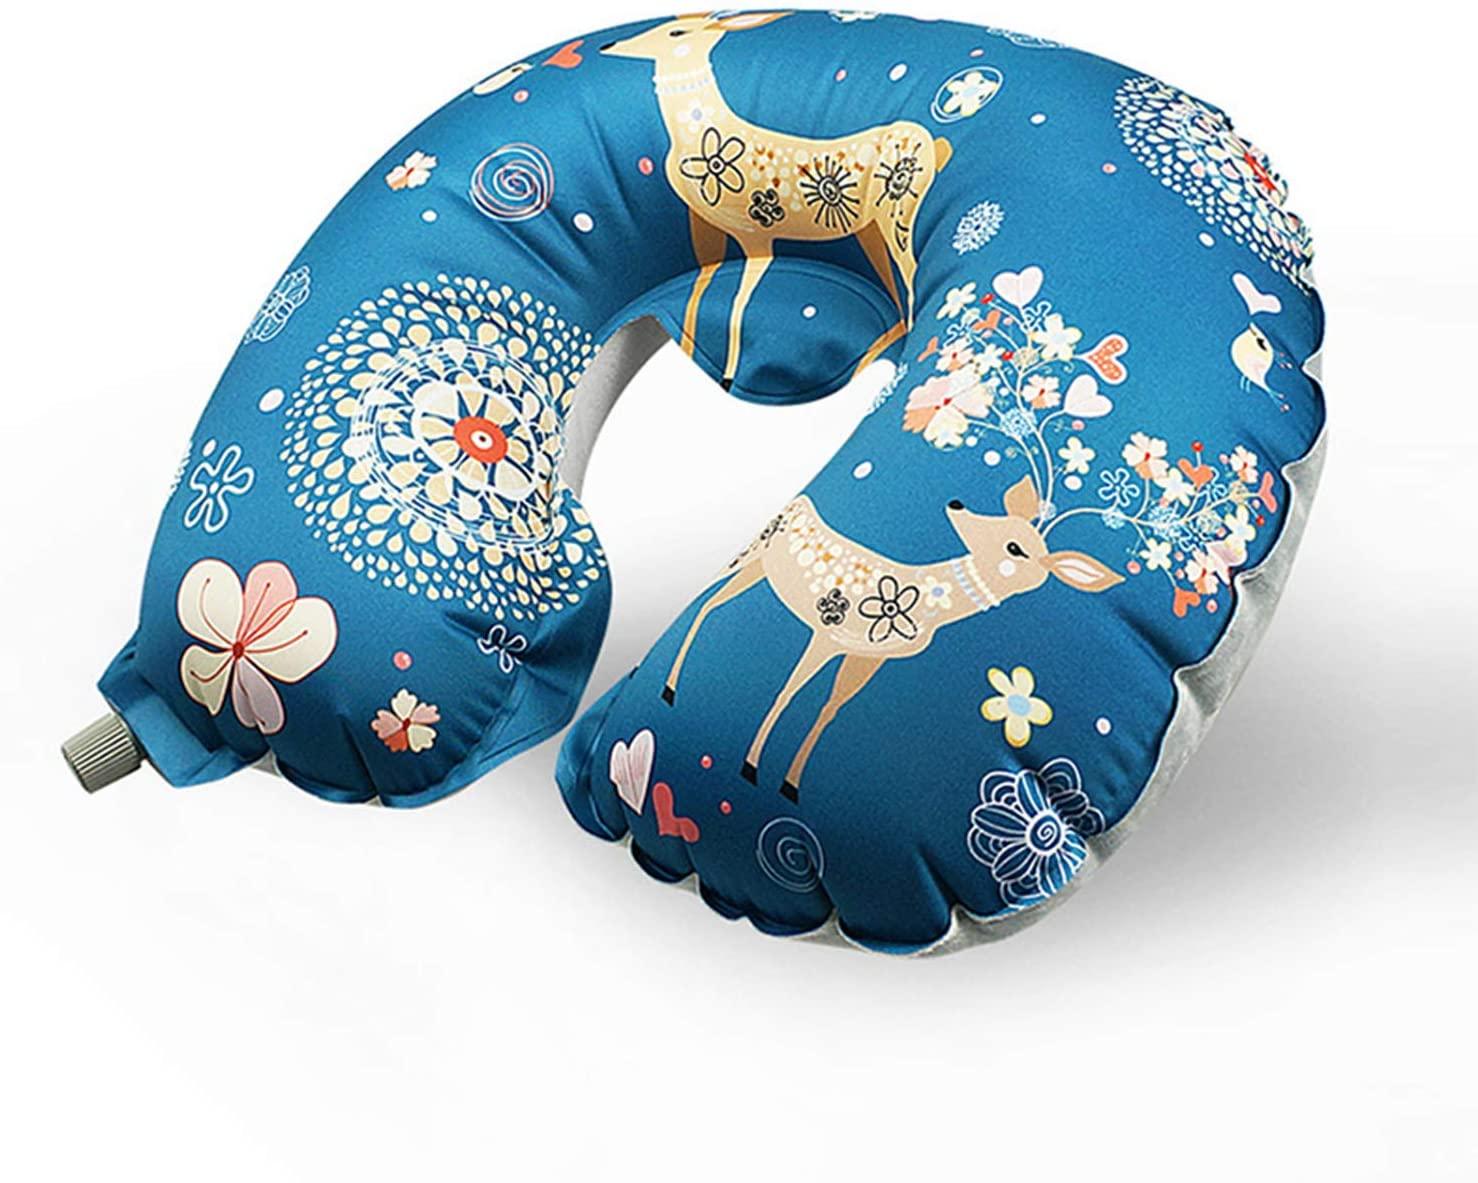 FengNiaoo TPU Inflatable Pillow Multi-Function Travel U-Shaped Pillow U-Type Inflatable Pillow Travel Three Treasures